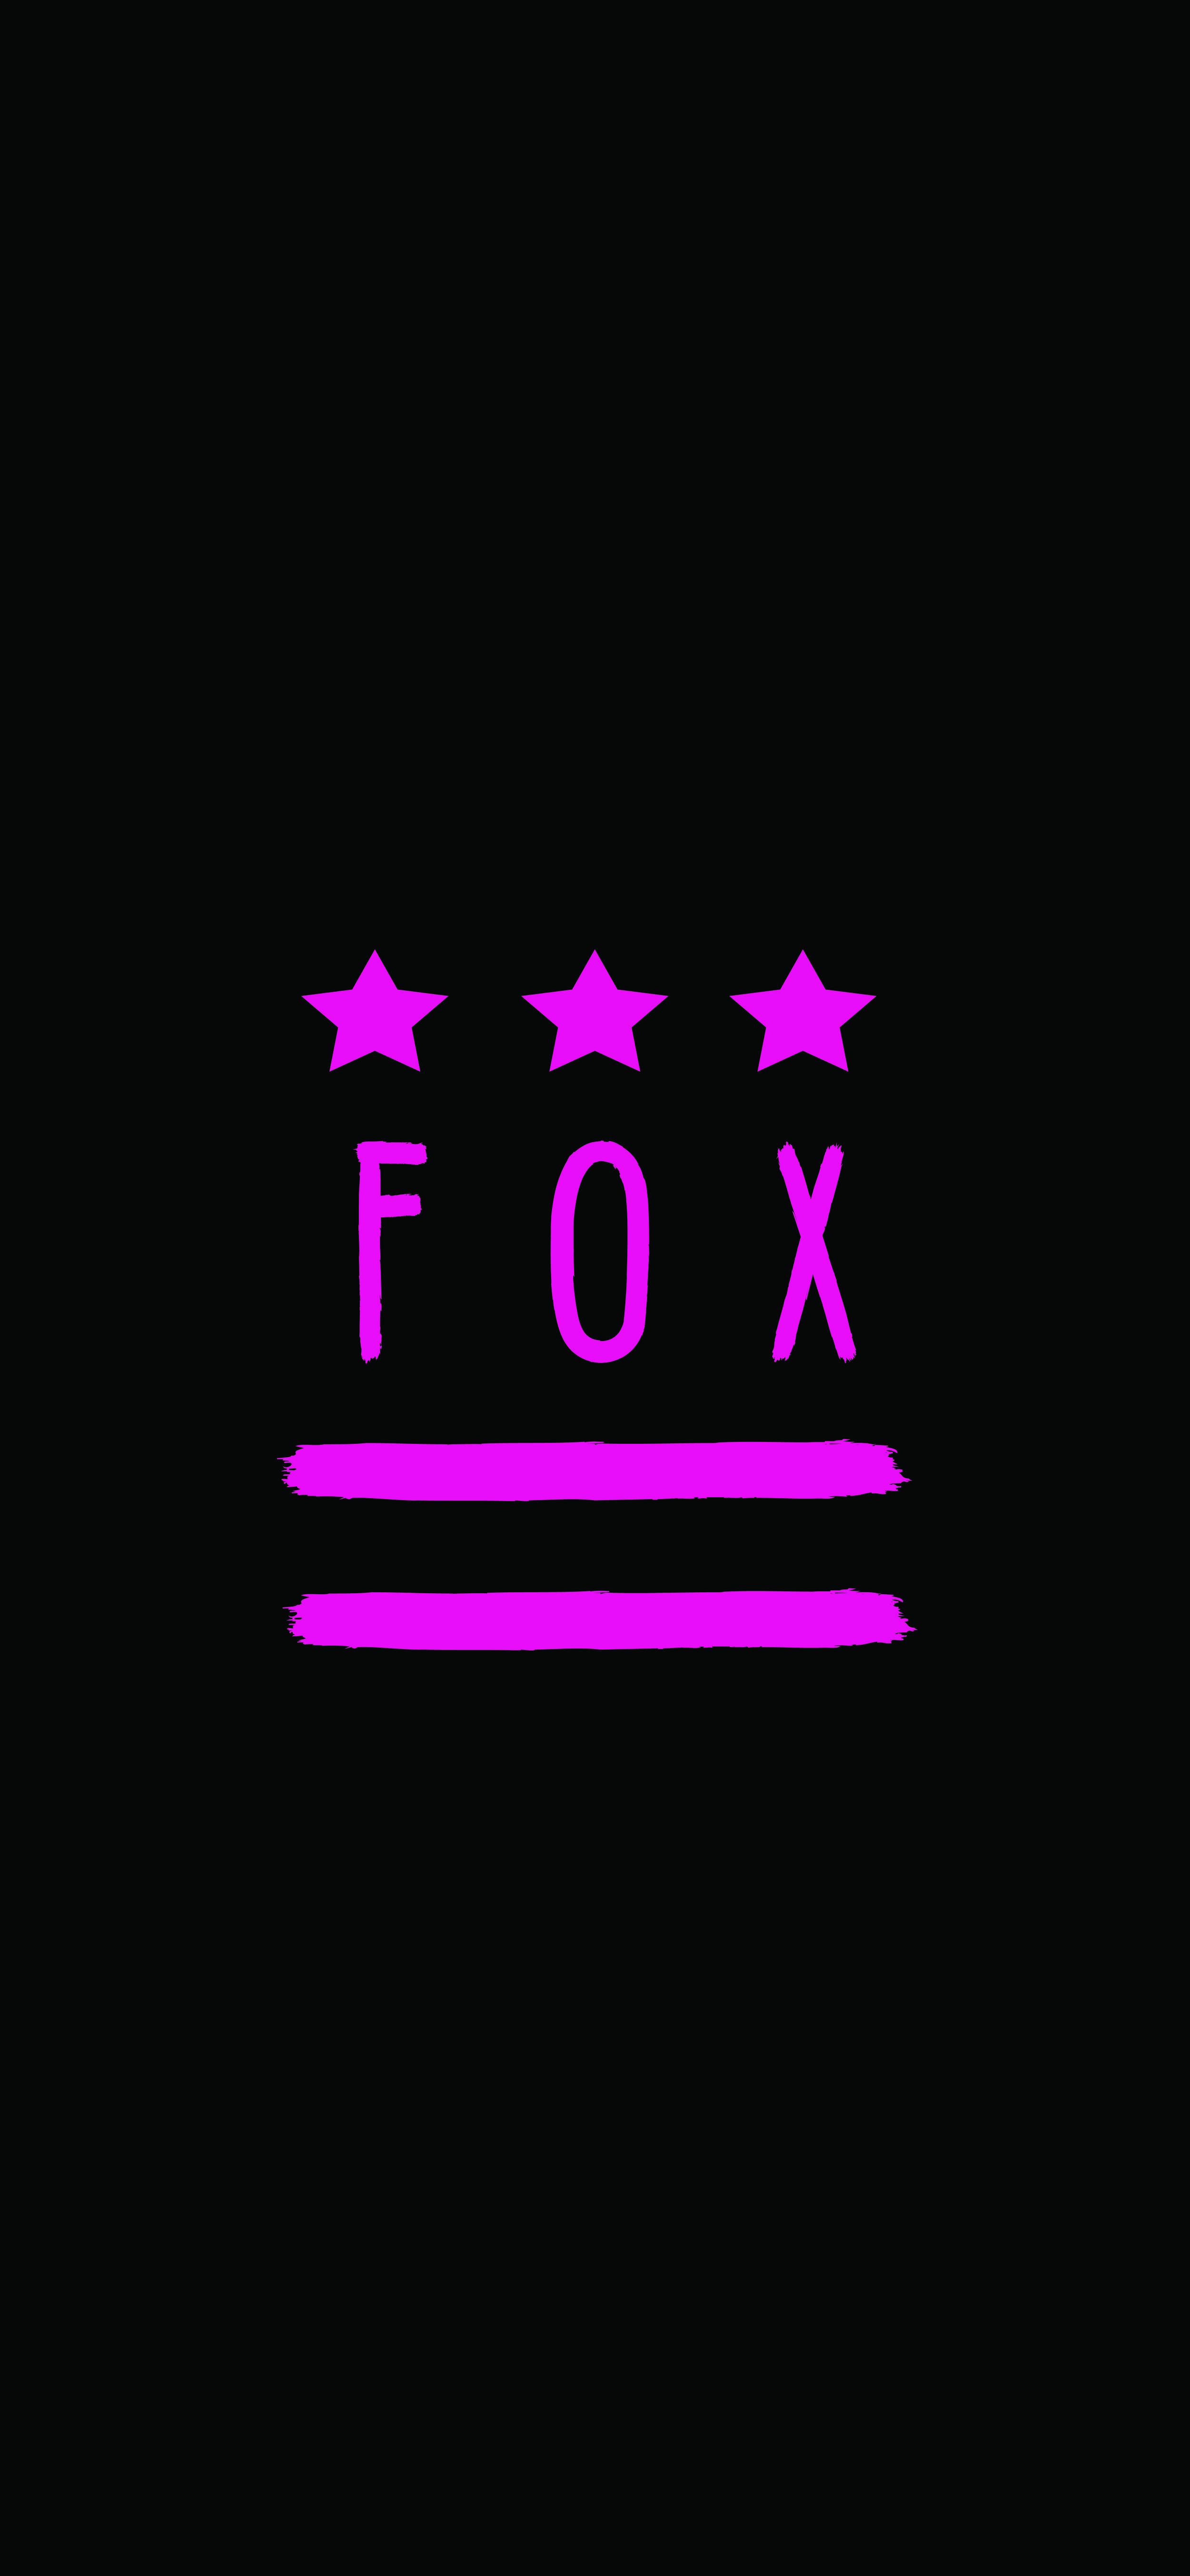 iPhone X BG - Stars Stripes Black Pink.jpg